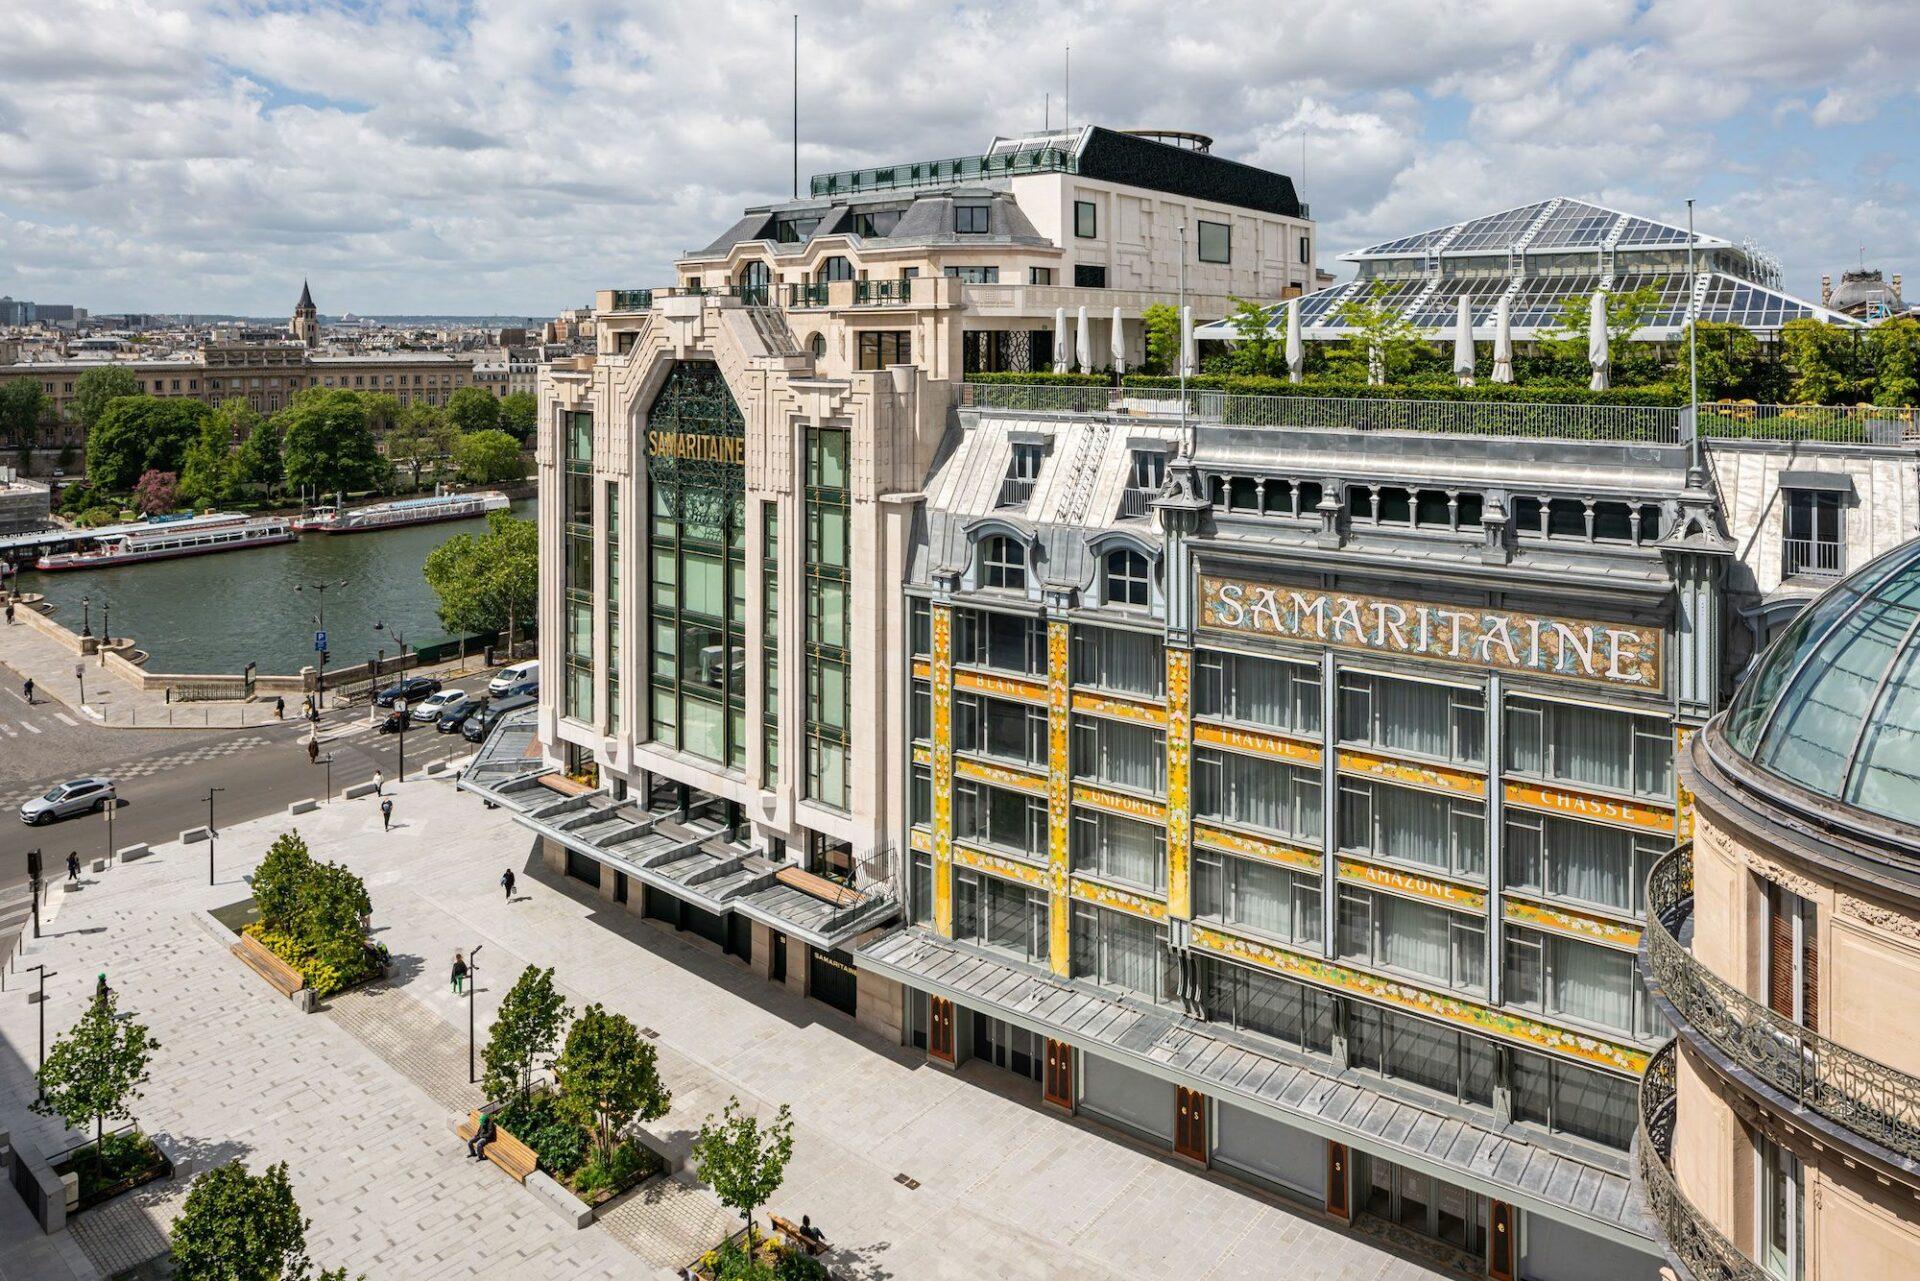 Cheval Blanc Paris: LVMH's Latest Five-Star Hotel in Historic Samaritaine Building